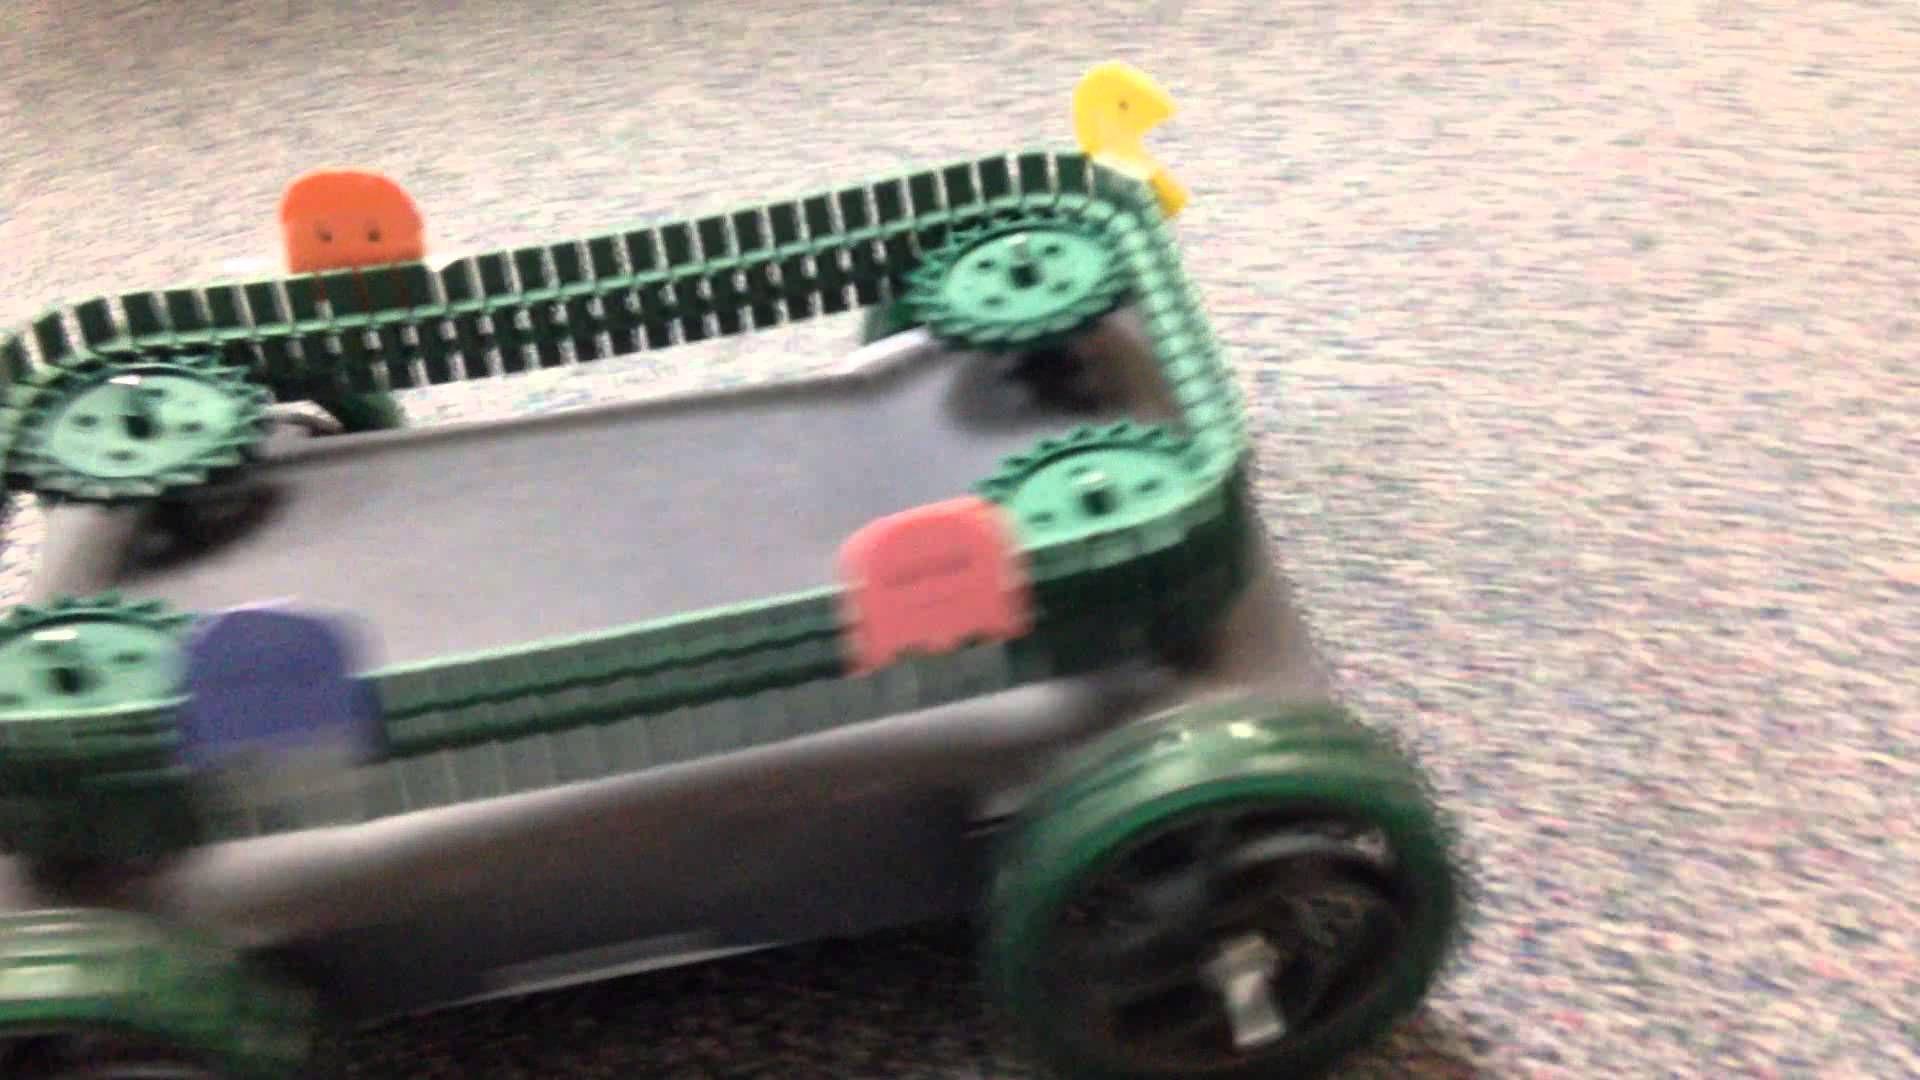 GTT VEX Pull Toy Pac Man And Ghosts YouTube School Robotics Classy Pac Man Recycling Bins And Re